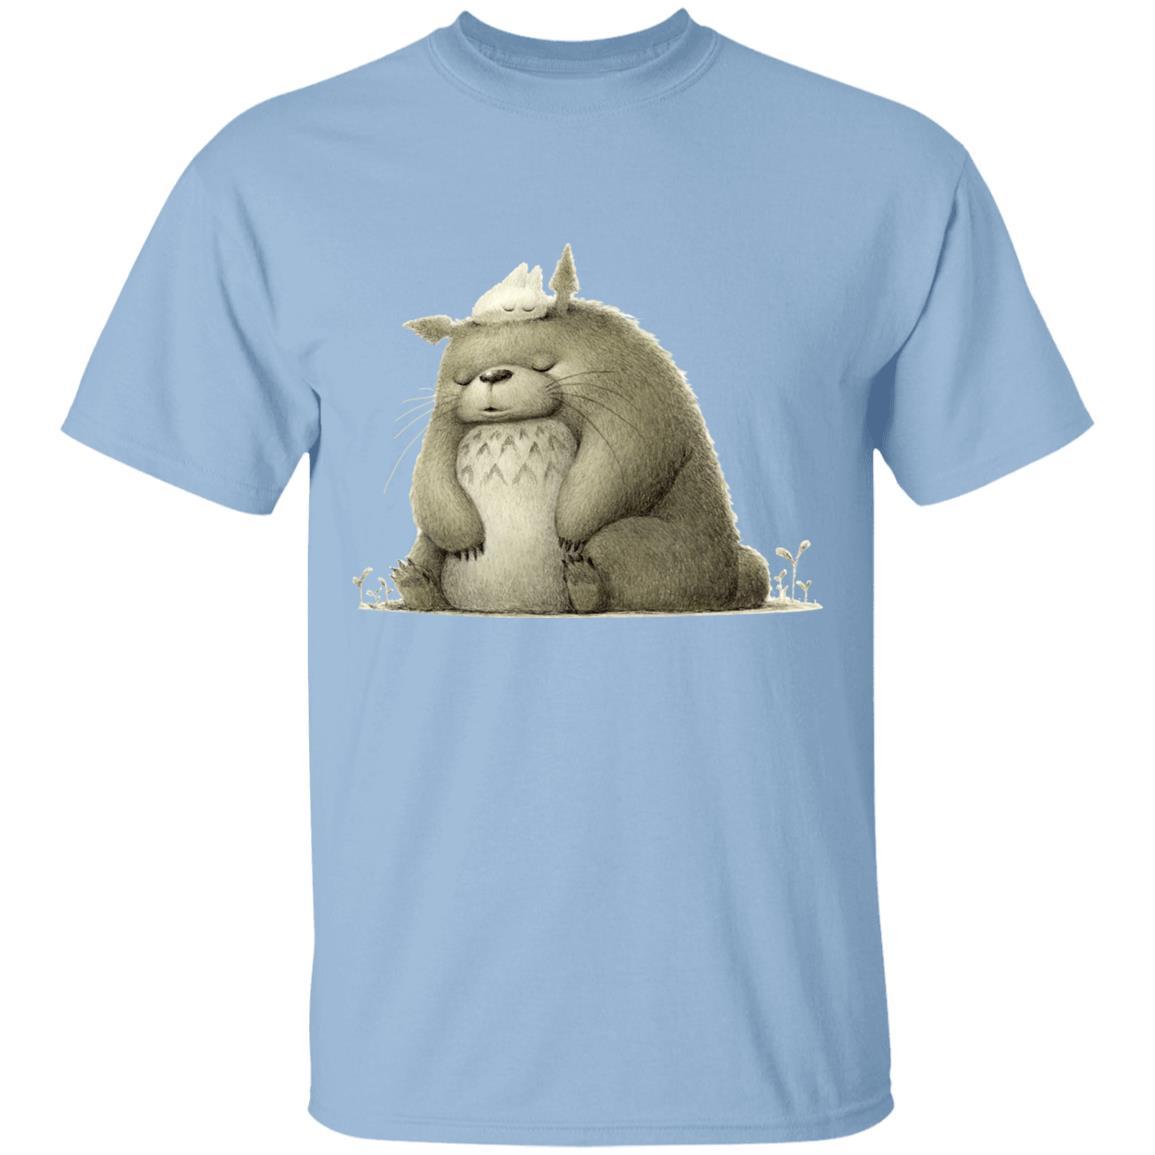 The Fluffy Totoro T Shirt